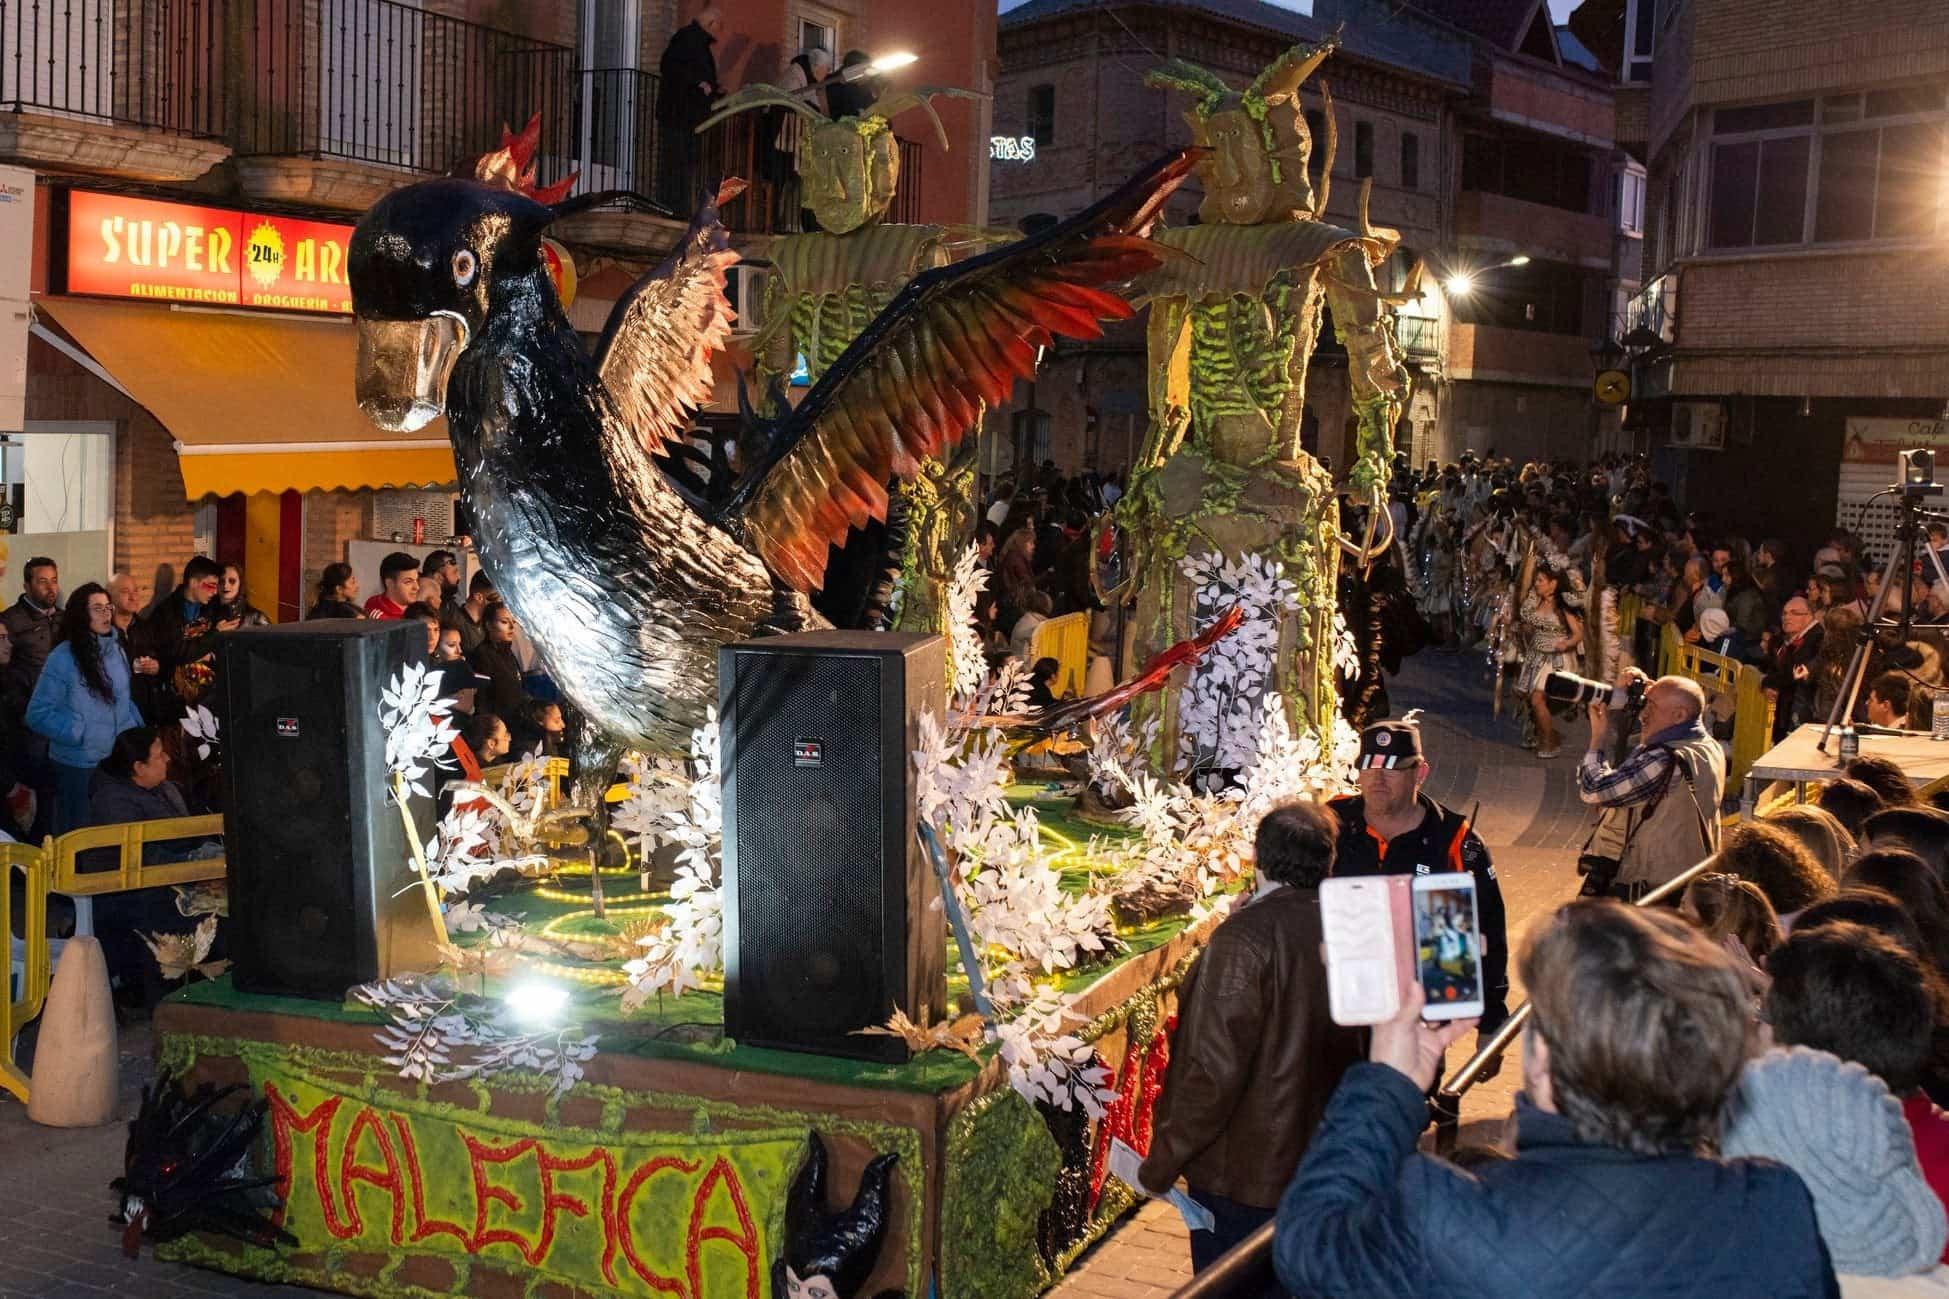 Carnaval de herencia 2020 ofertorio 78 - Selección de fotografías del Ofertorio del Carnaval de Herencia